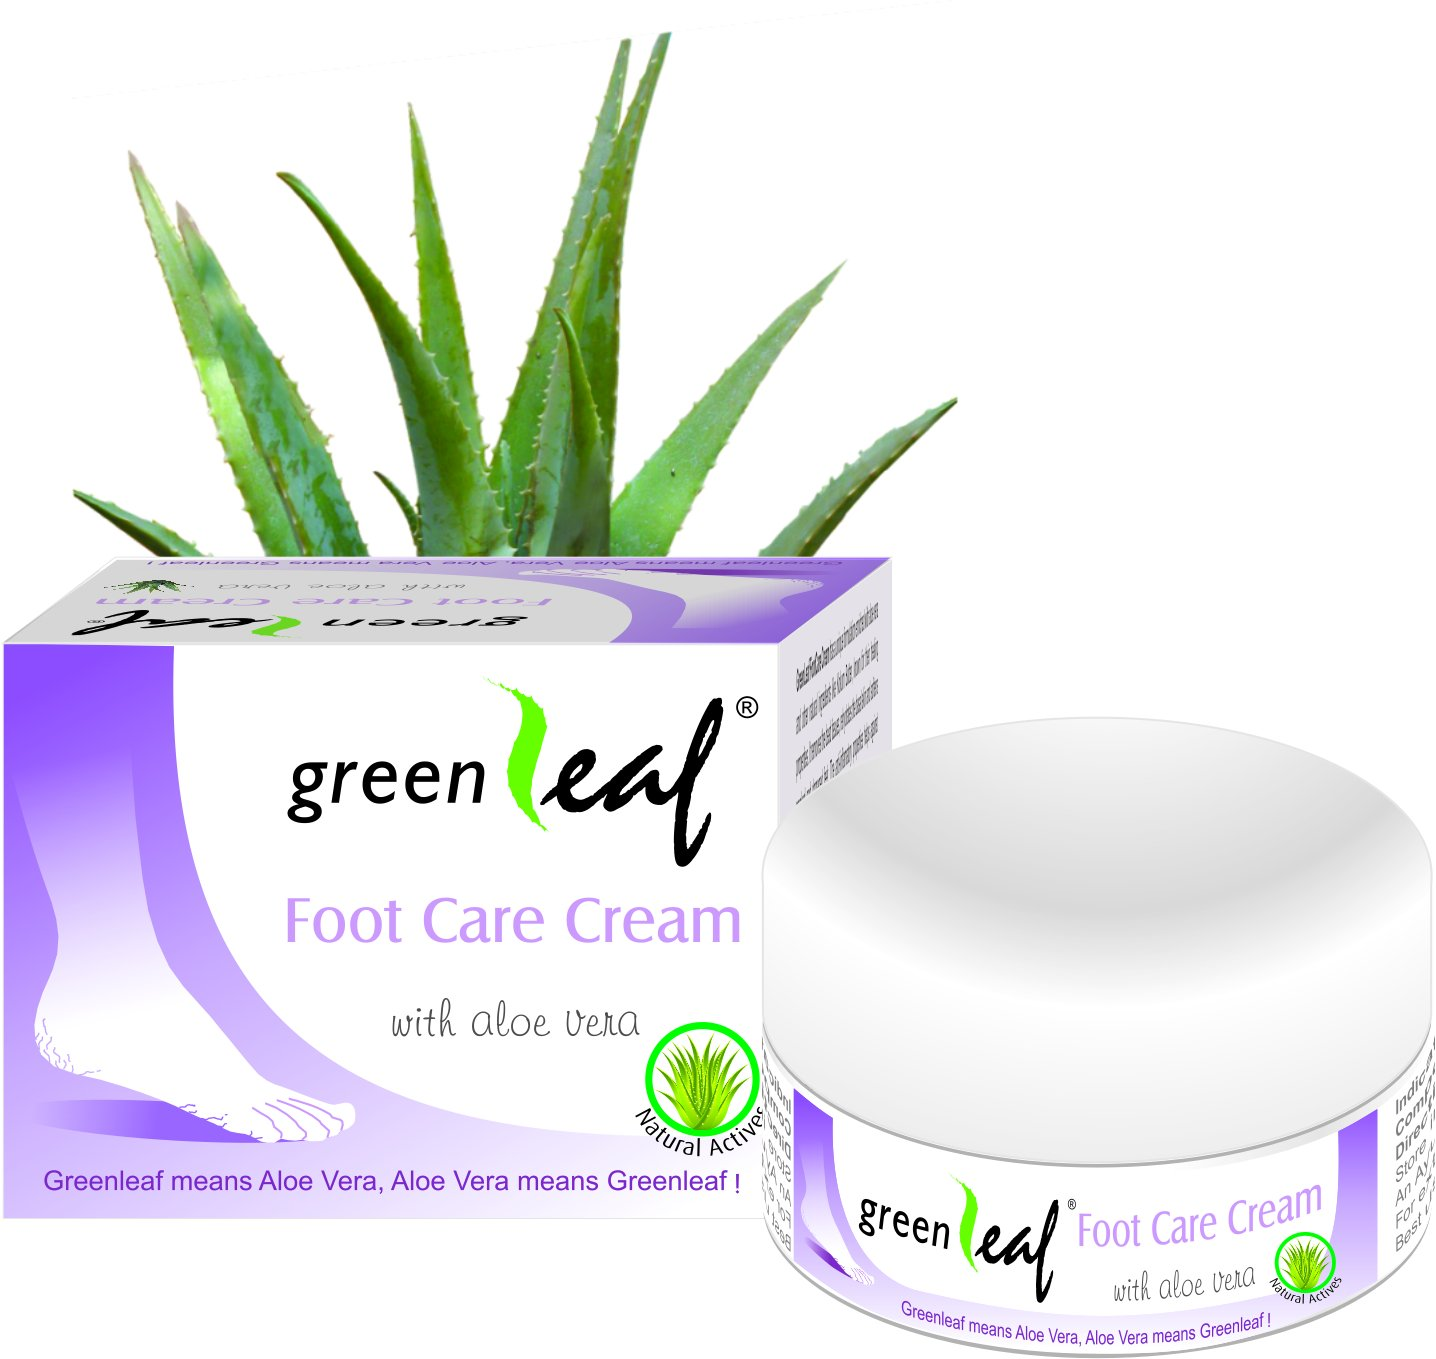 Green Leaf Foot Care Cream Image